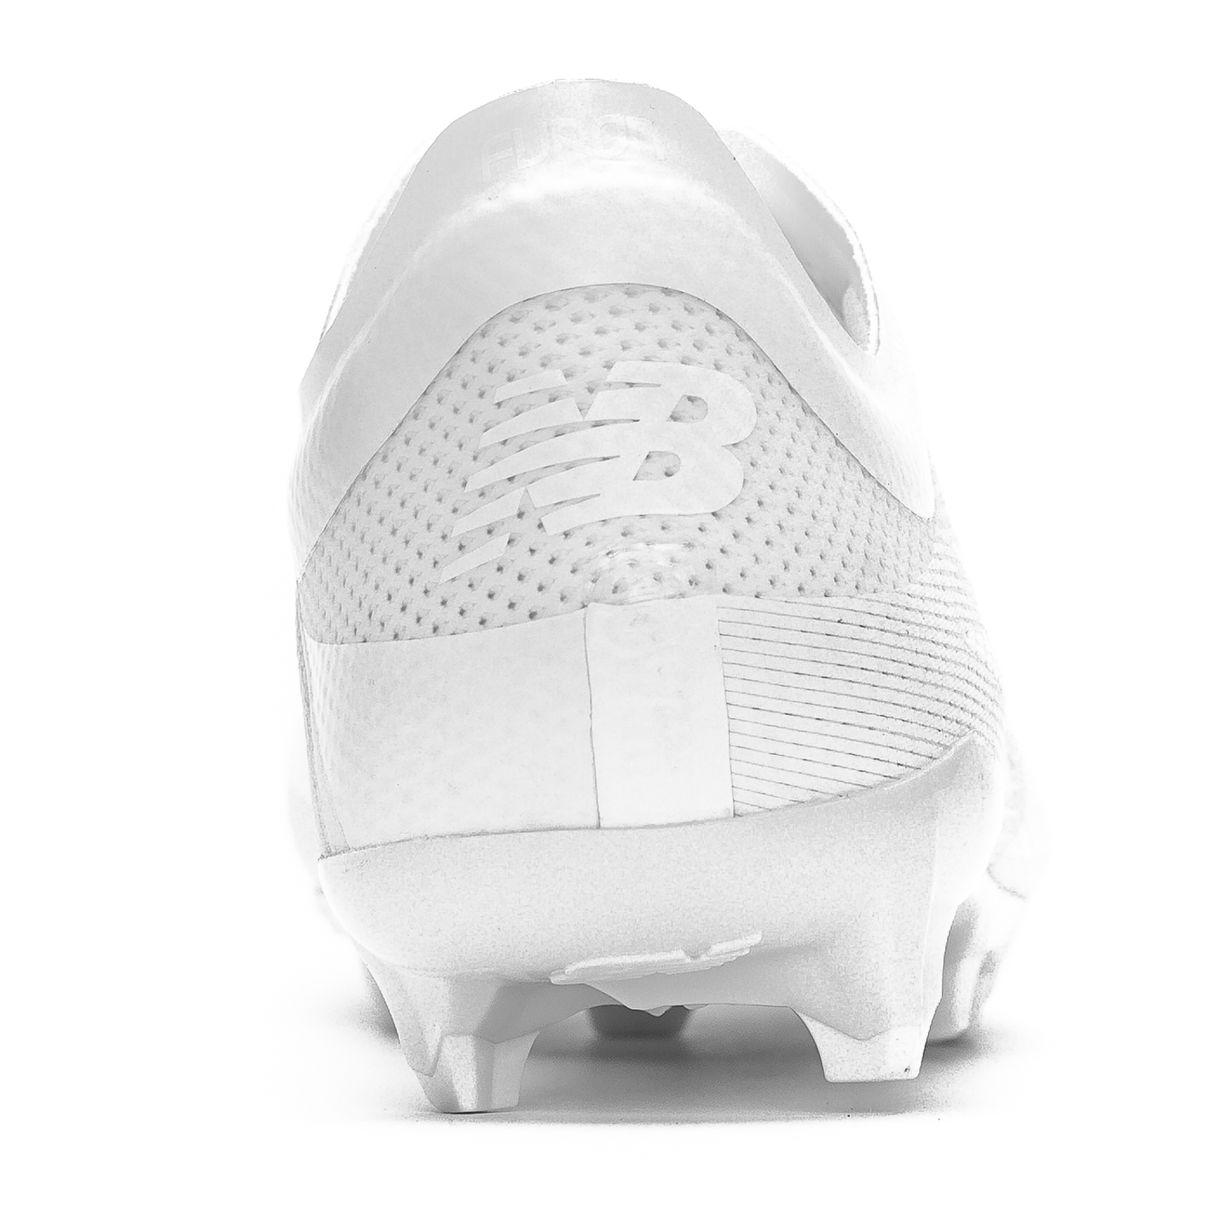 Furon 2.0 whiteout pata